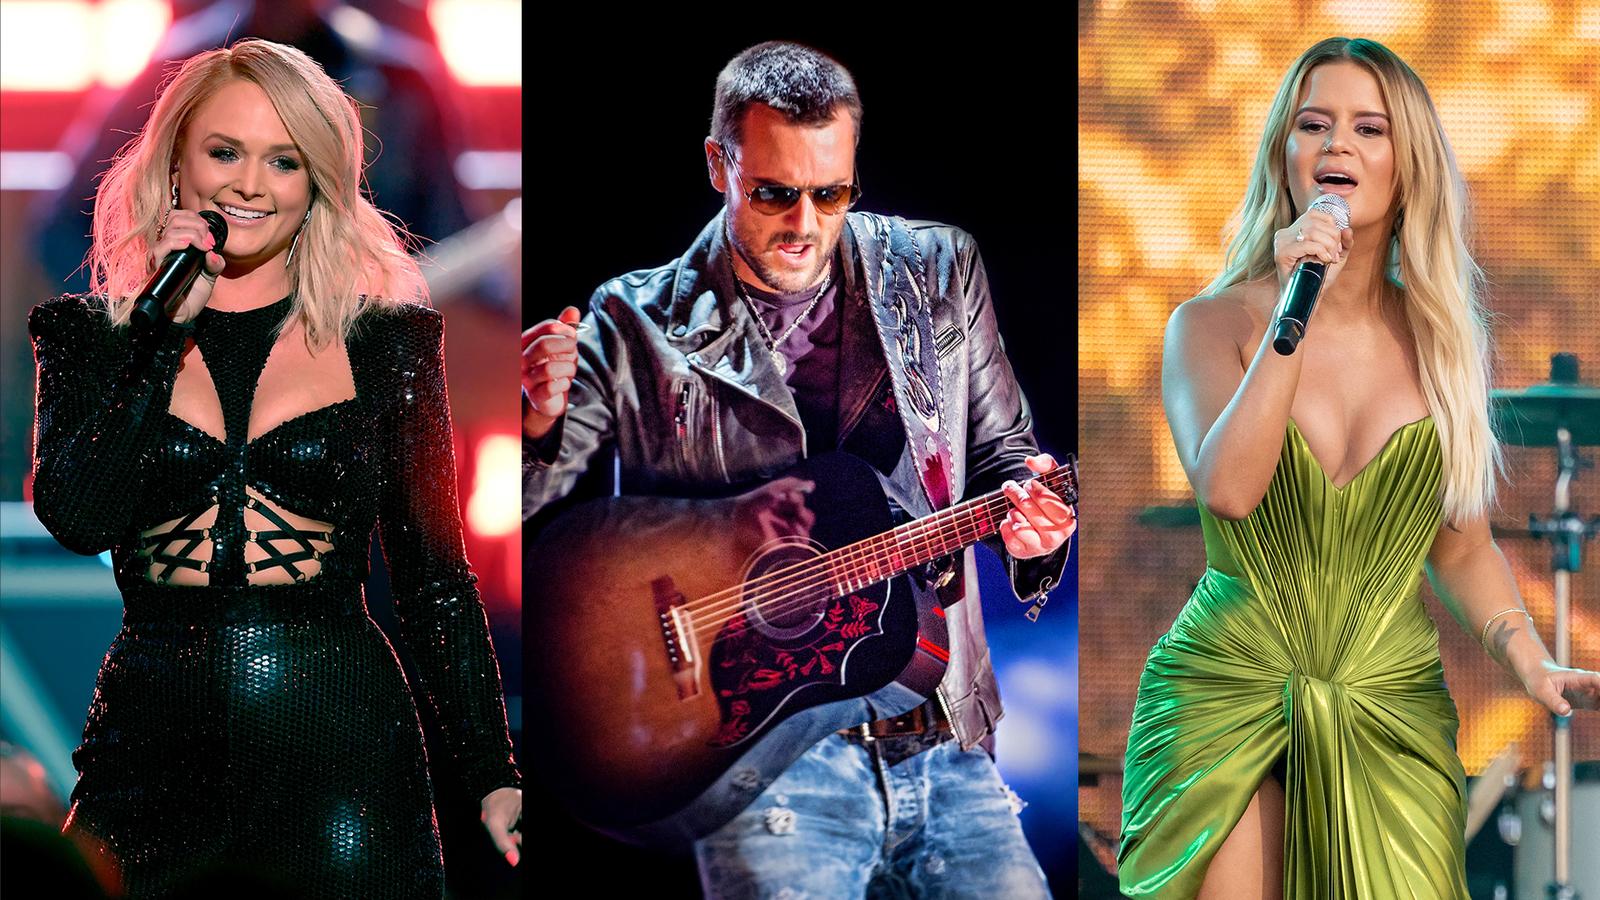 2020 CMA Awards performers include Miranda Lambert, Eric Church, Maren Morris, Florida Georgia Line